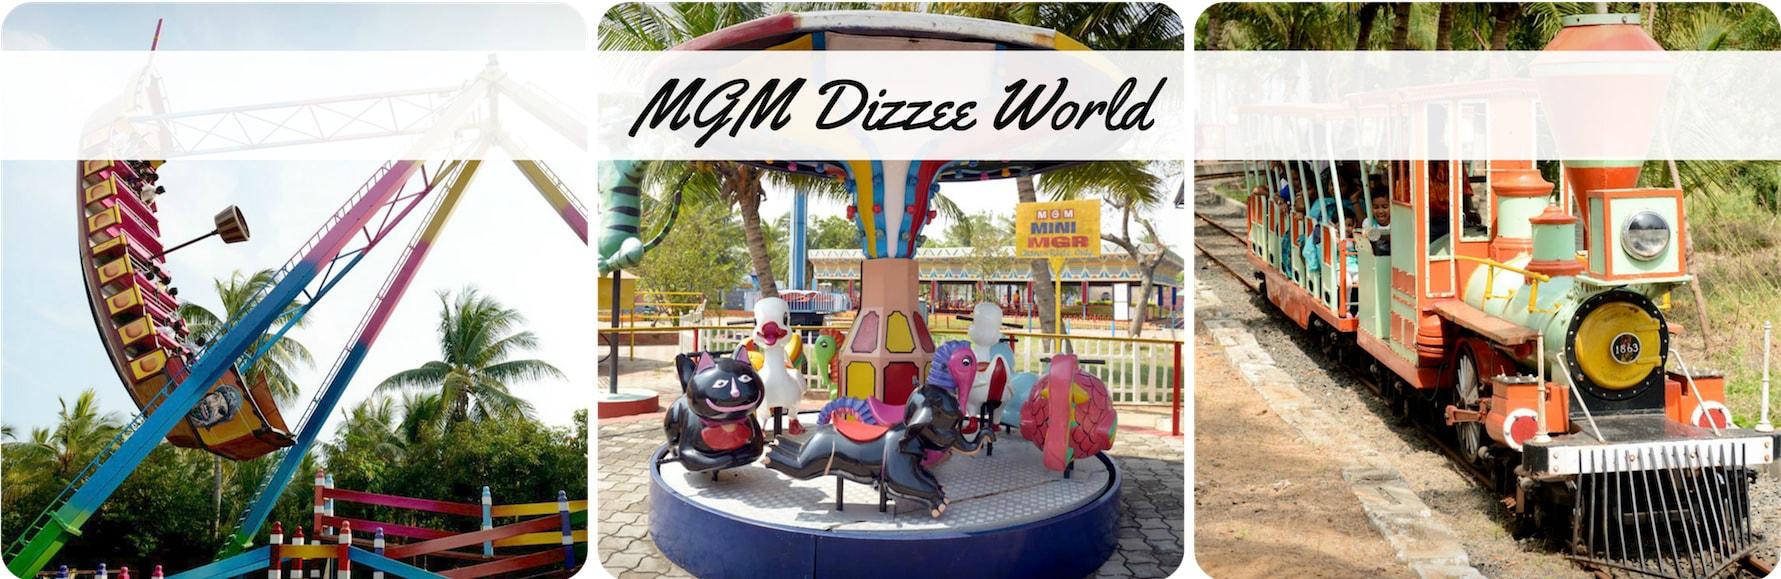 MGM Dizzee World.